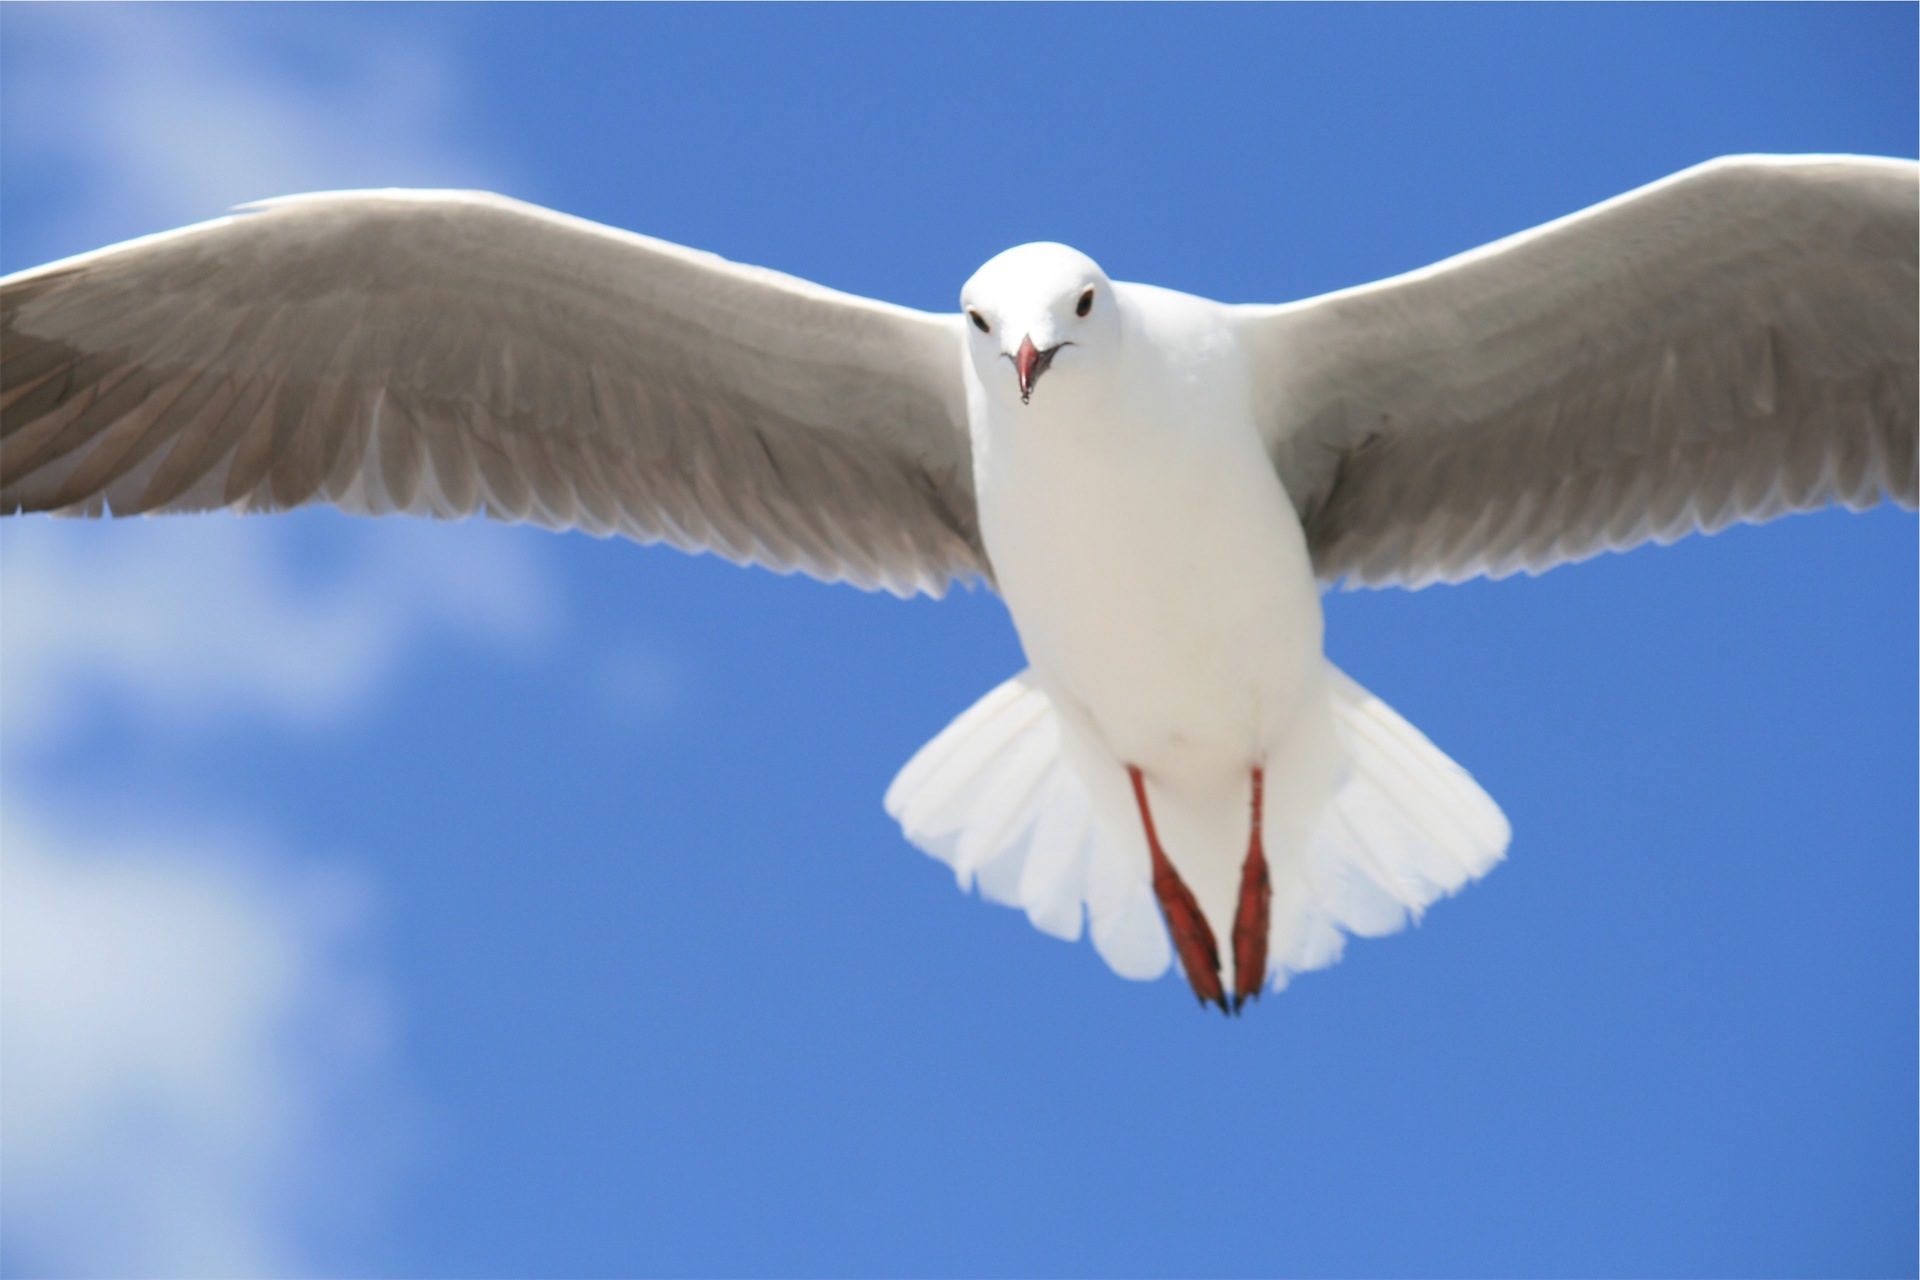 Mouette, ailes, vol, Ave, Sky - Fonds d'écran HD - Professor-falken.com